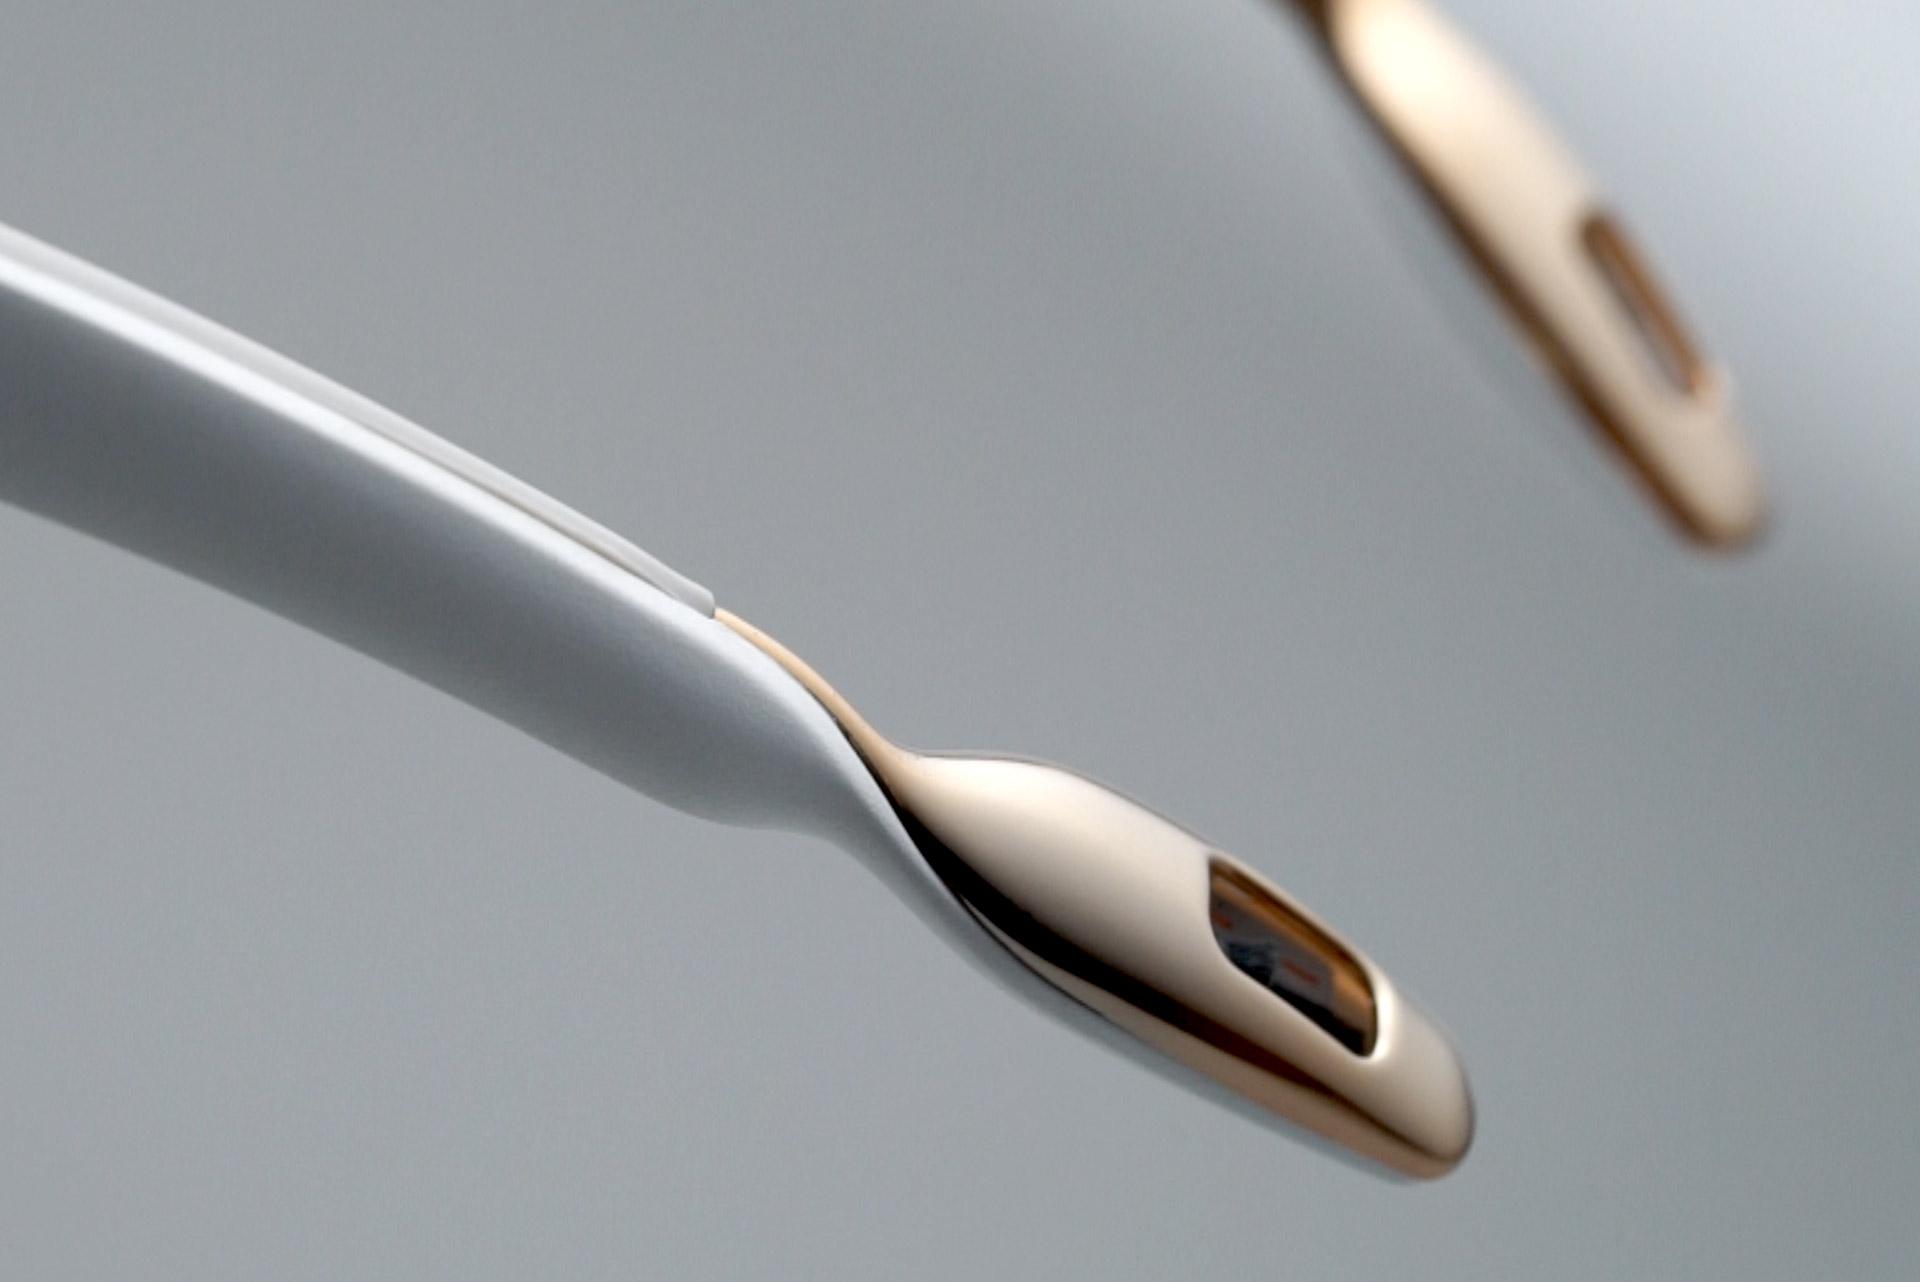 collier ionic purificateur d air airvida rose novelair. Black Bedroom Furniture Sets. Home Design Ideas